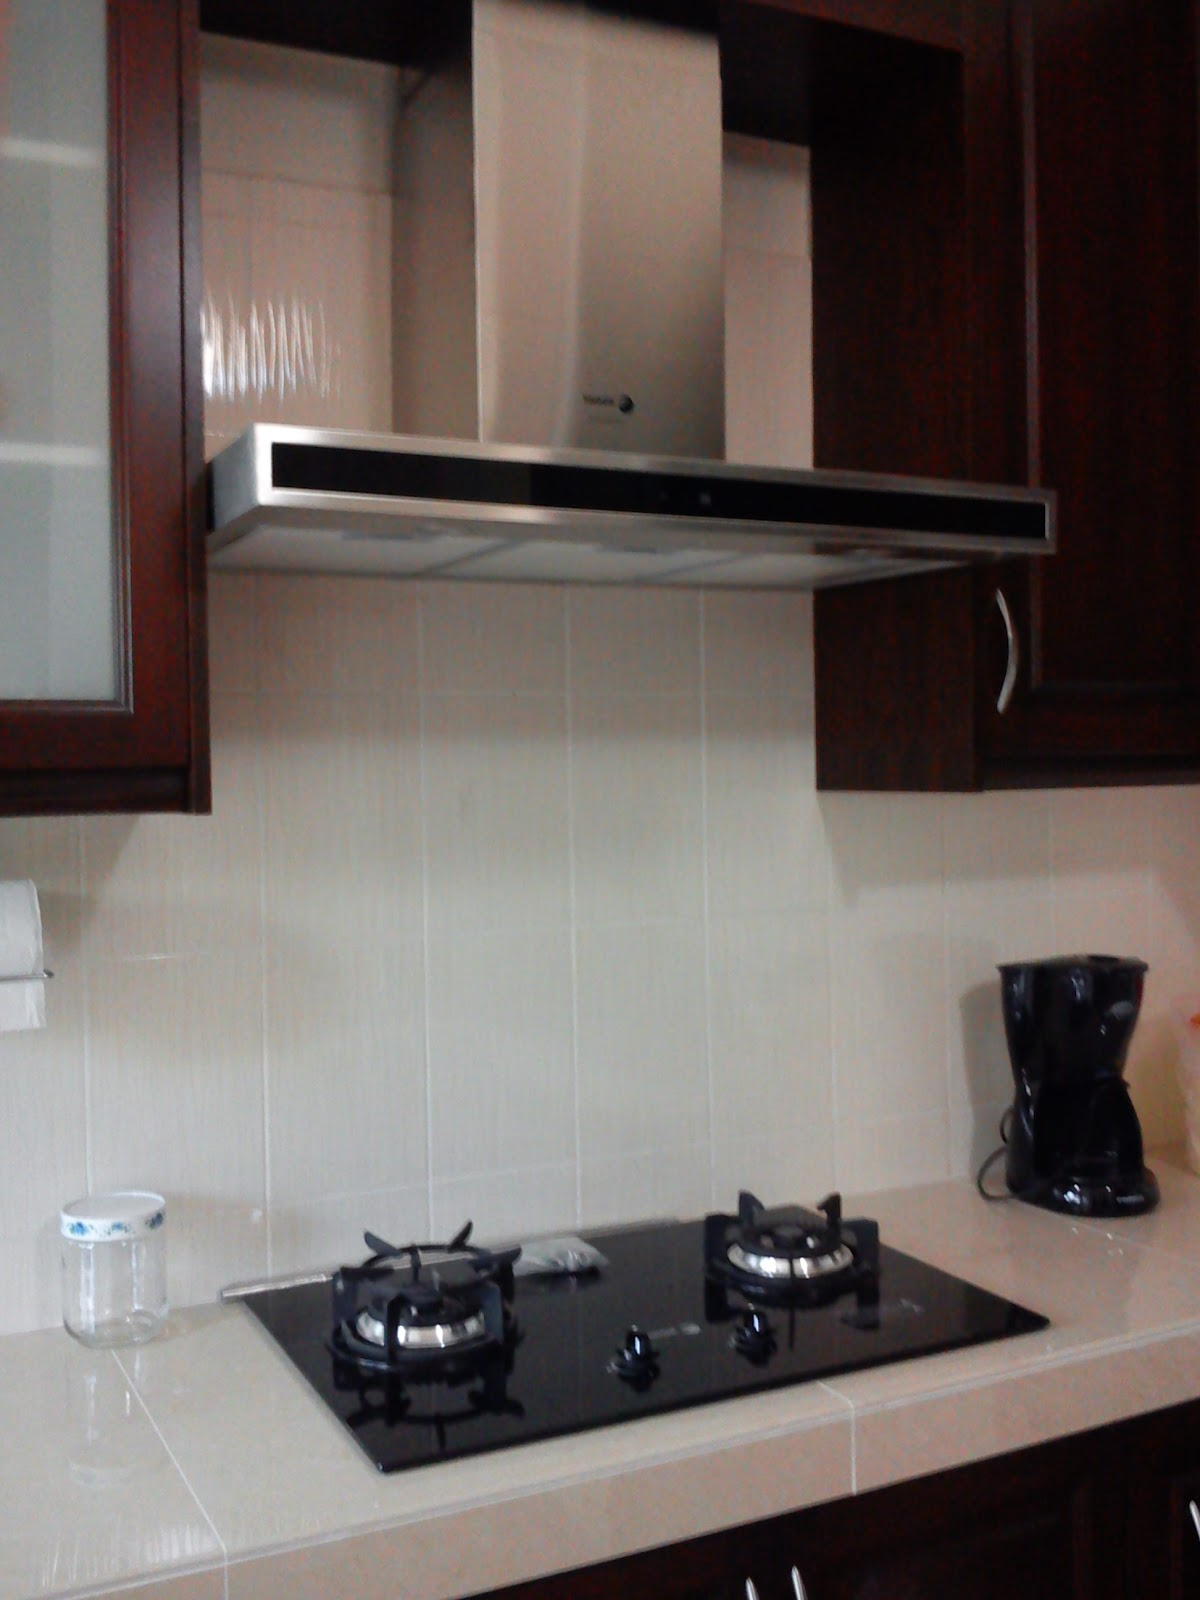 Fmk Whirls Pindah Rumah Ubahsuai Dapur